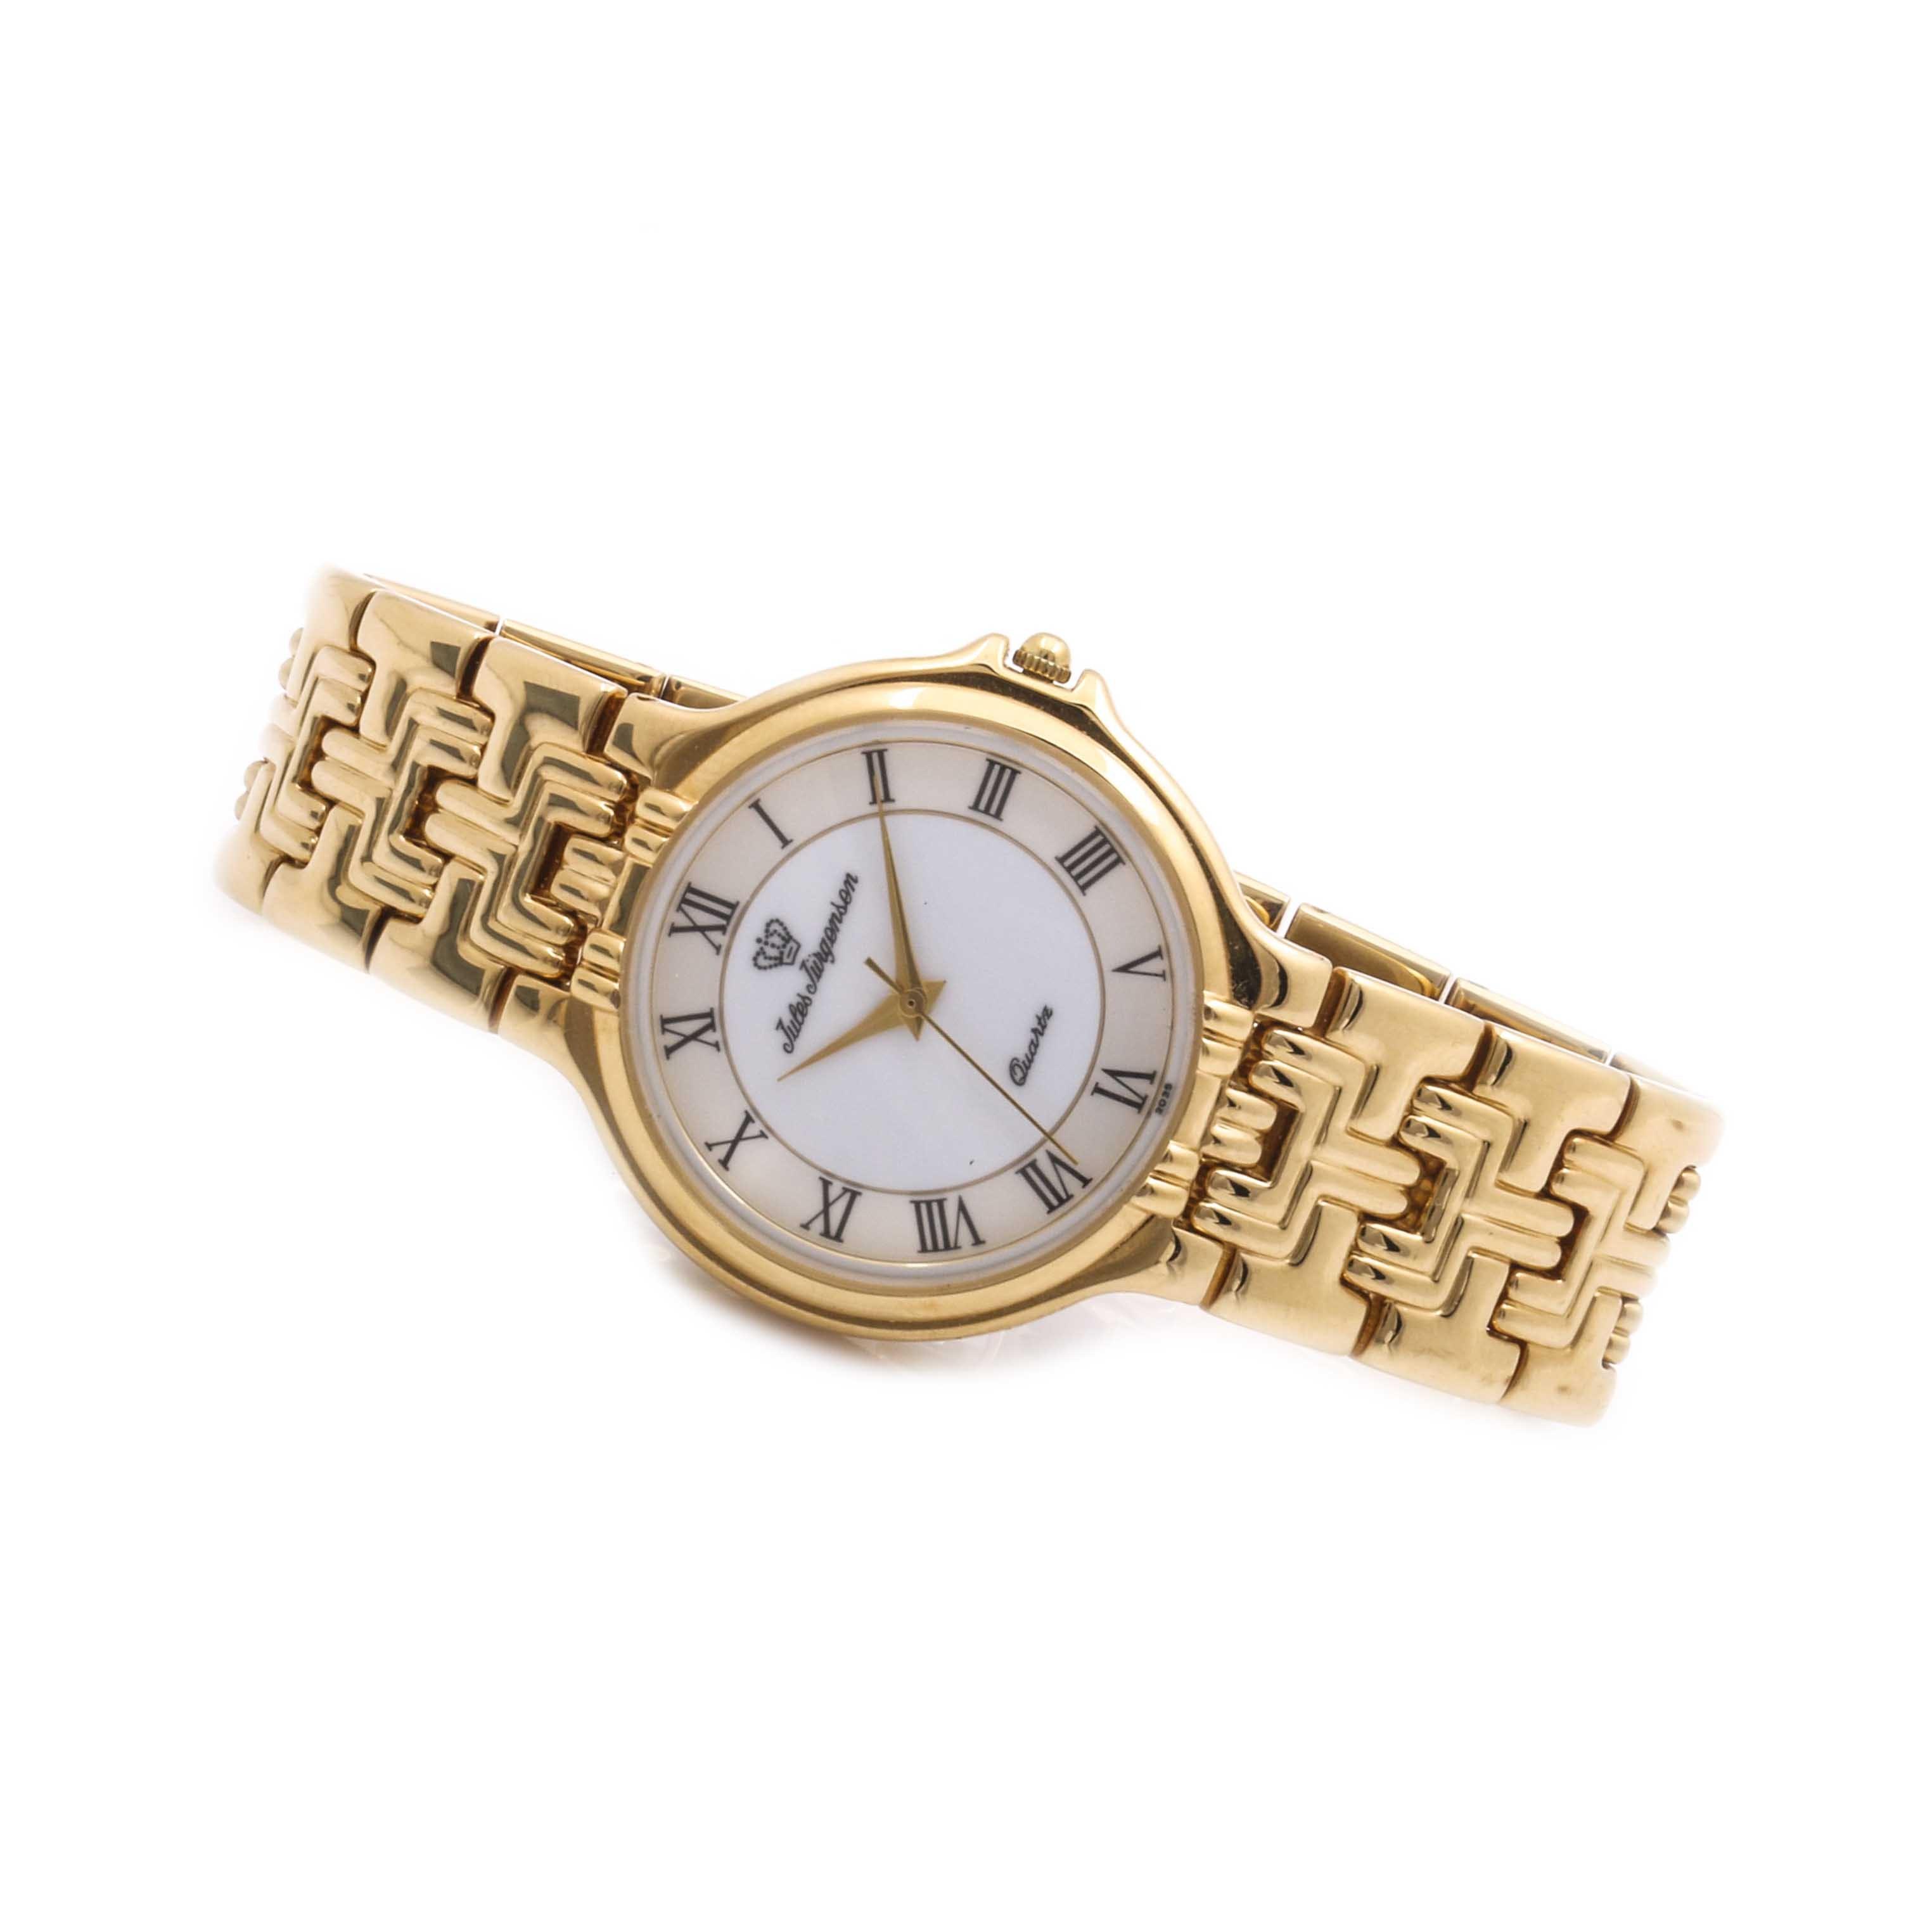 Jules Jürgensen Gold Tone Quartz Wristwatch